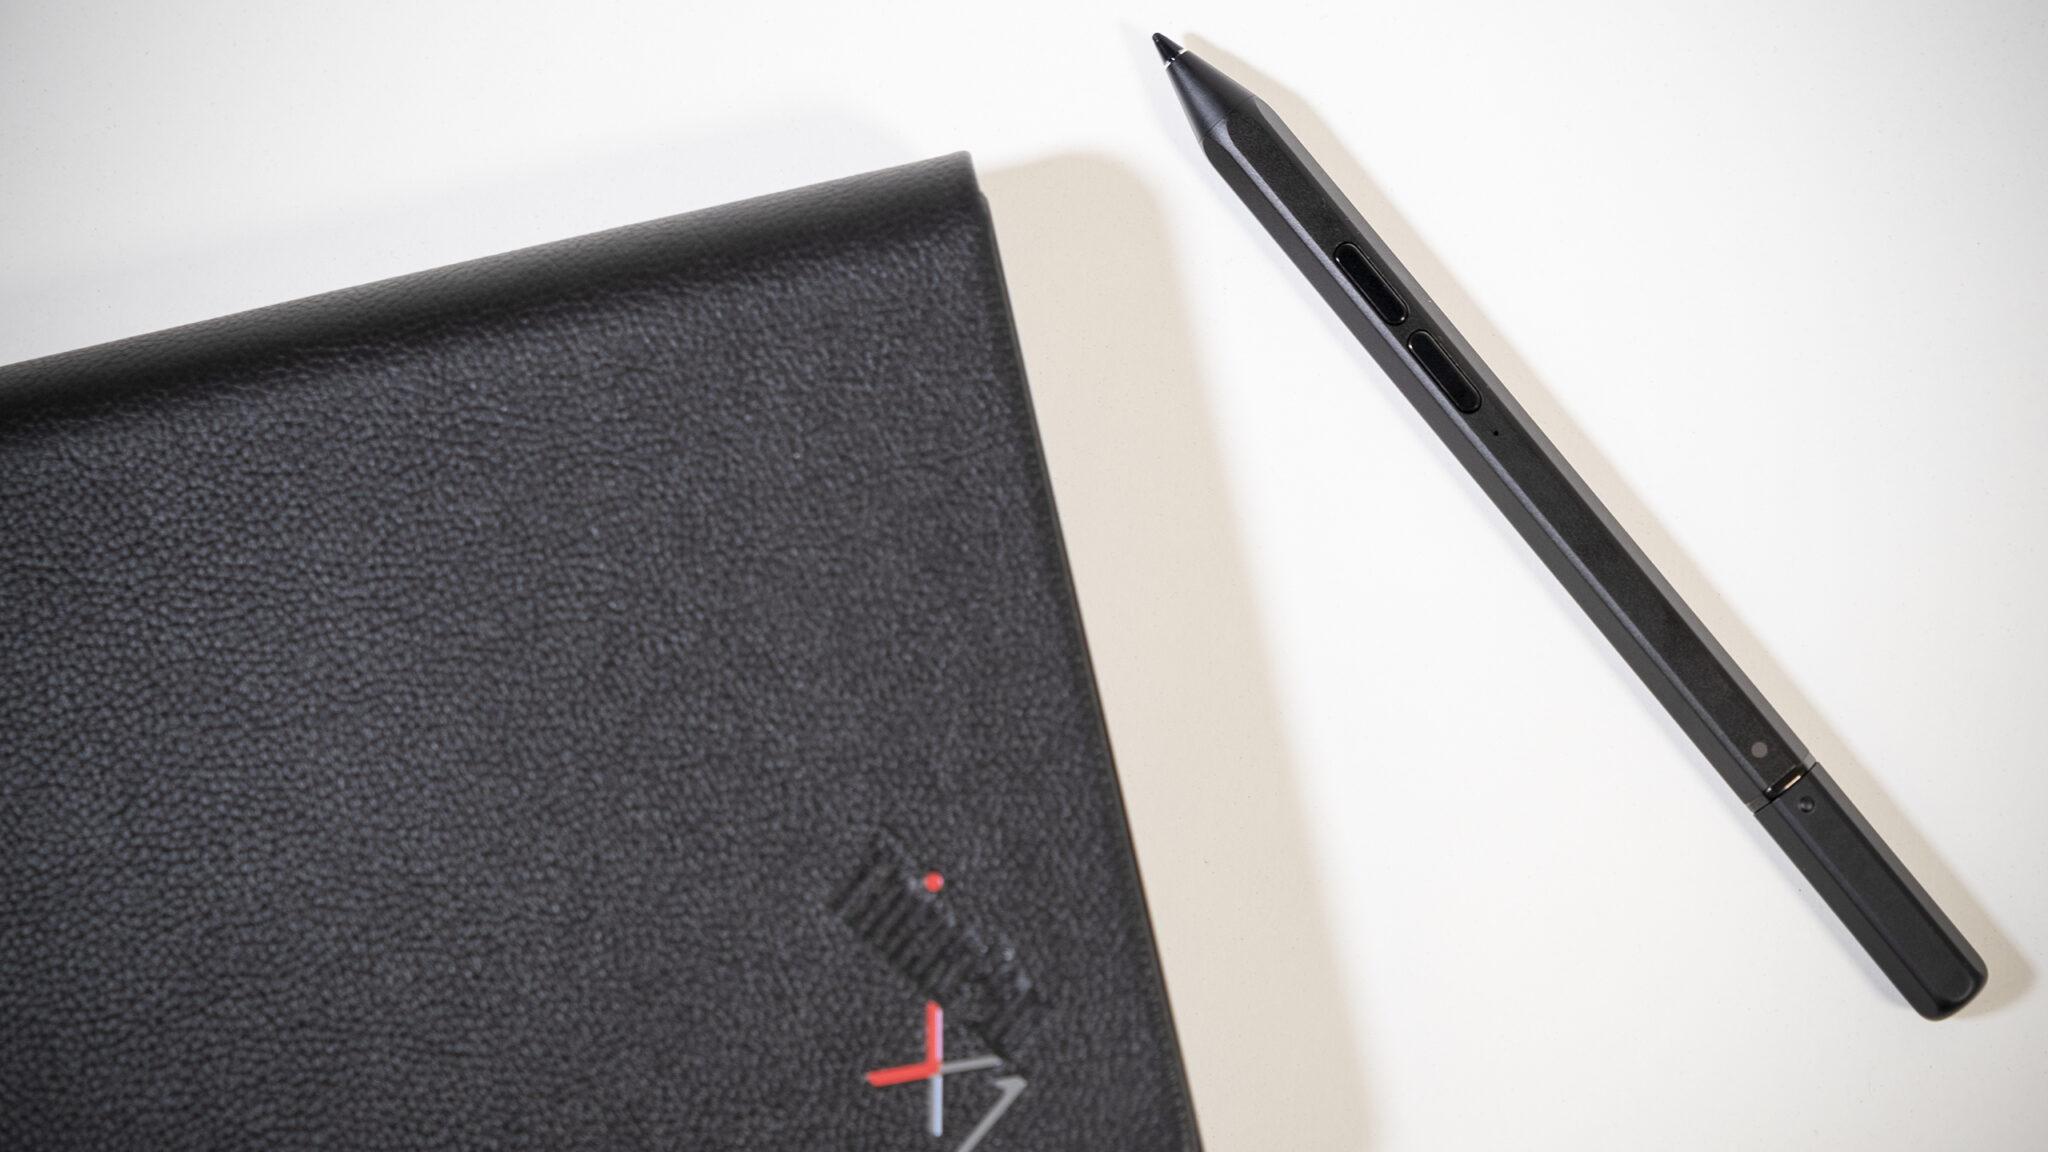 Lenovo ThinkPad X1 Stift Close Up